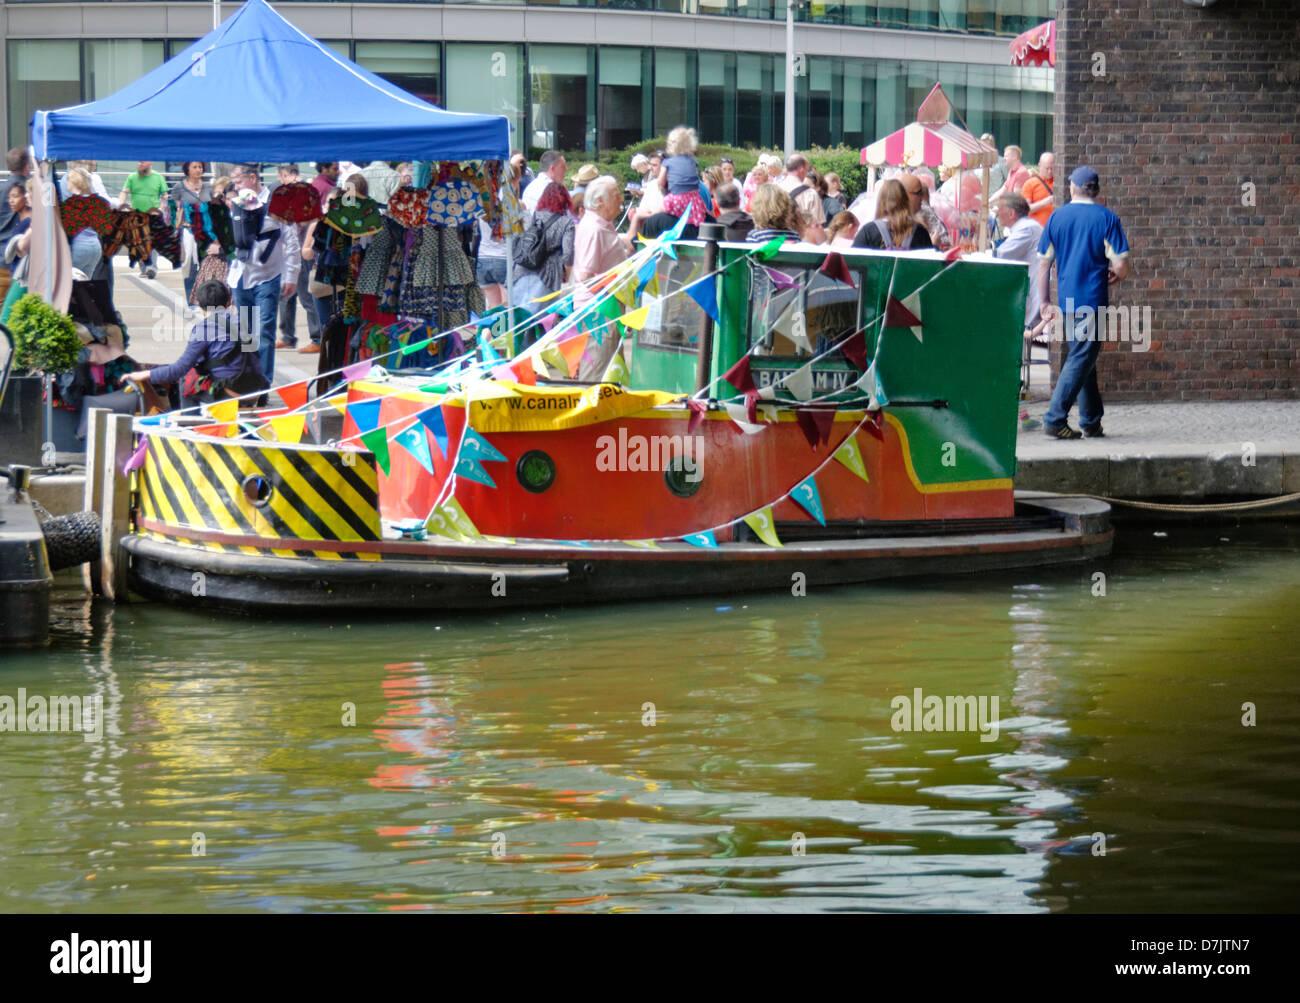 Little Venice Canal Festival - Stock Image